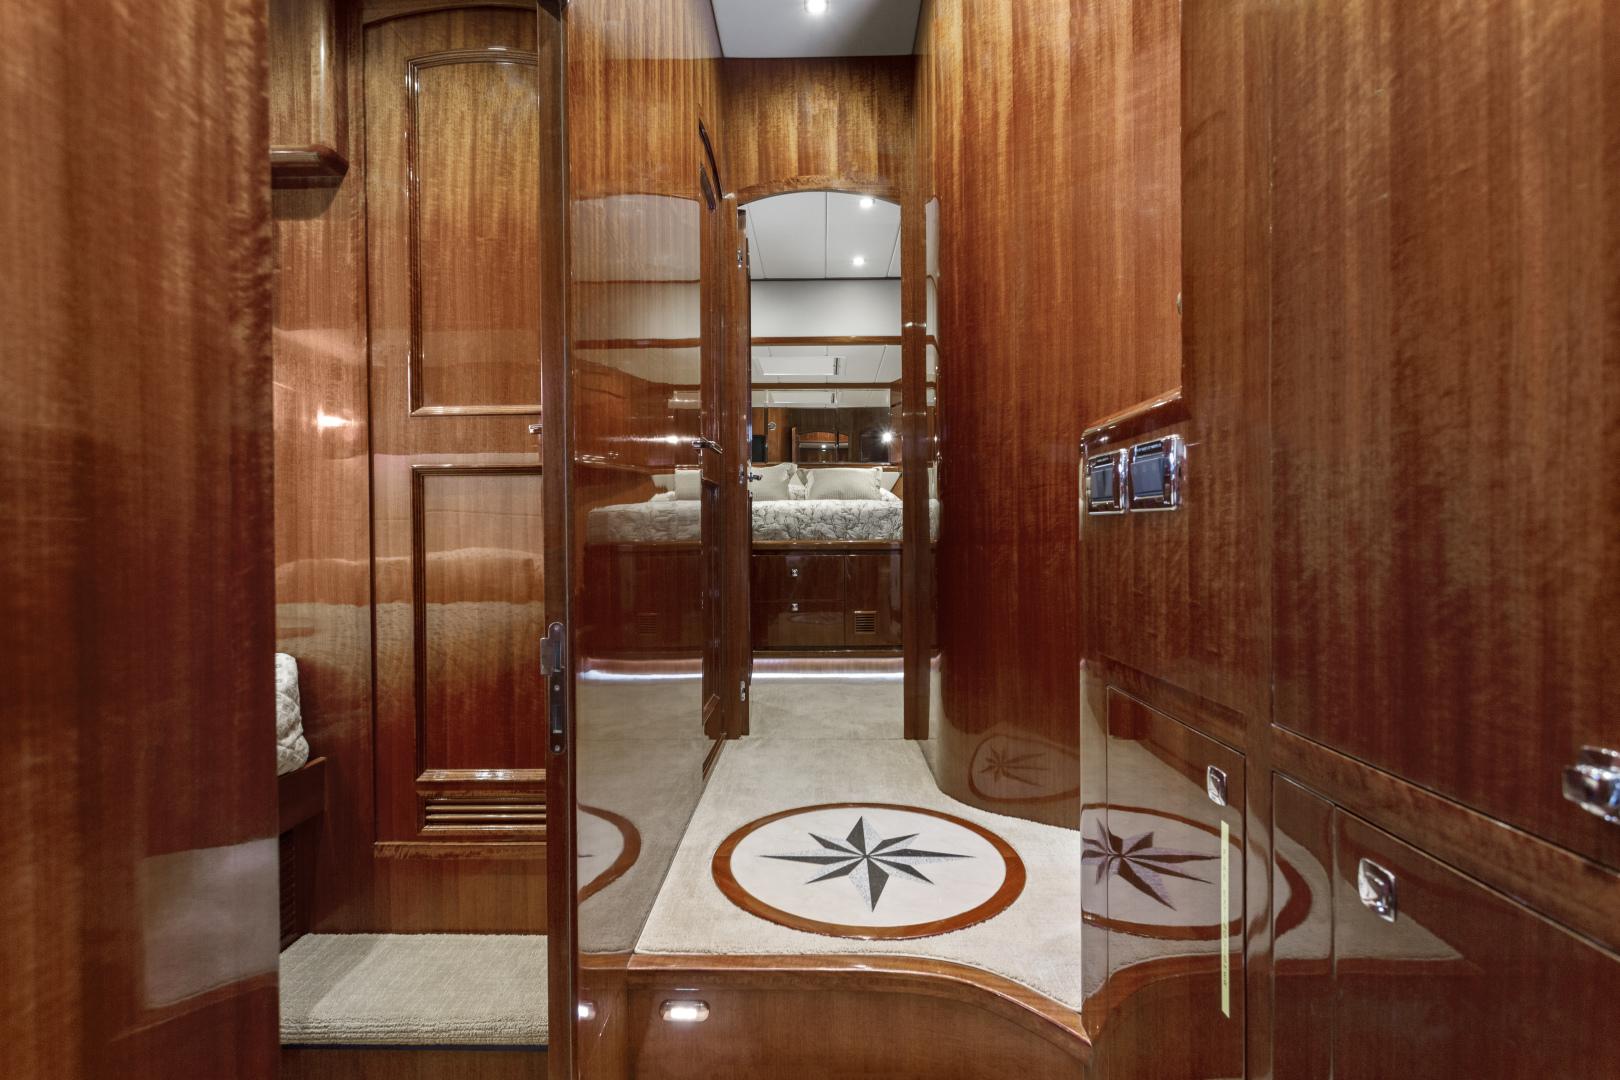 Hampton-76 Skylounge Motoryacht 2014-ODYSEA San Diego-California-United States-PASSAGEWAY-1165172 | Thumbnail